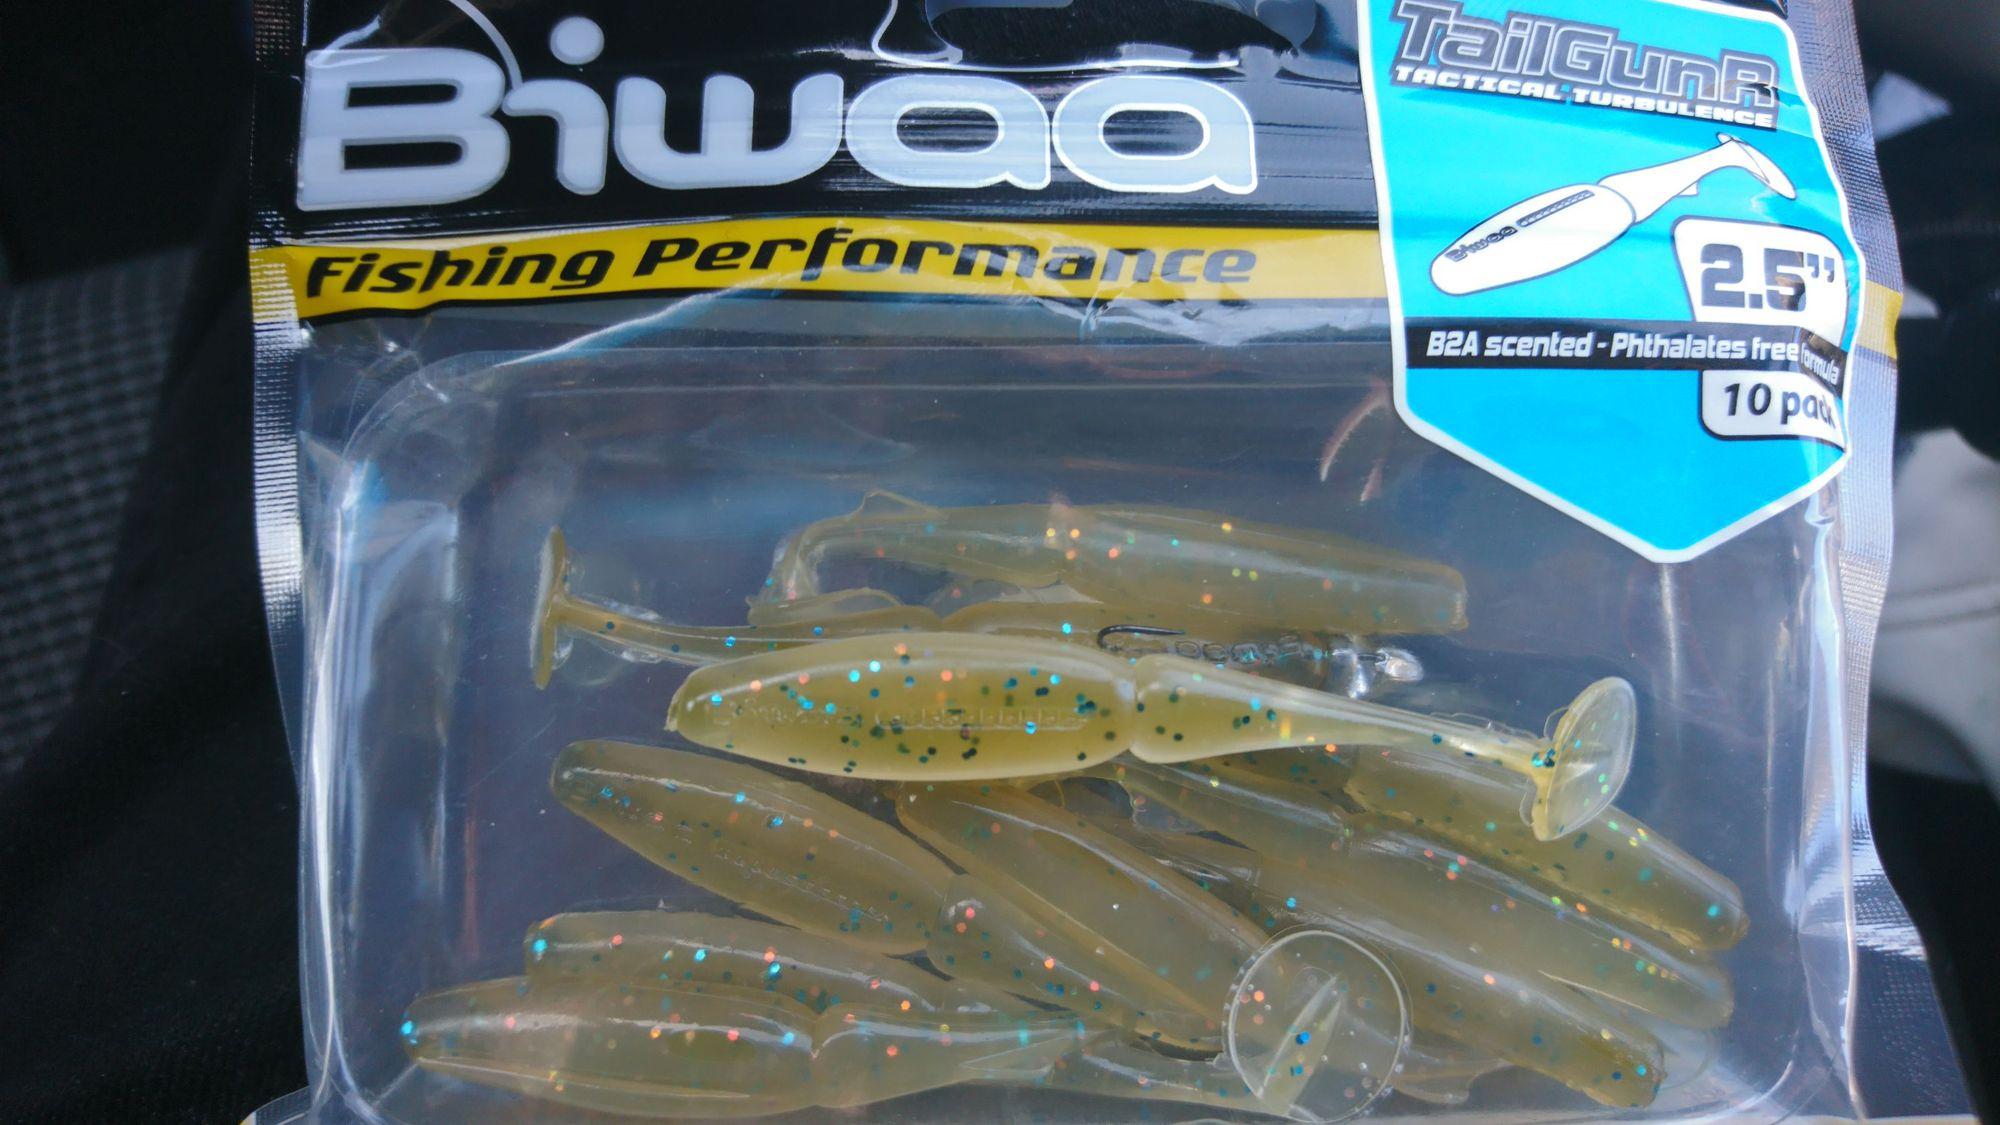 Biwaa Fishing Performance tailgunR 2.5''